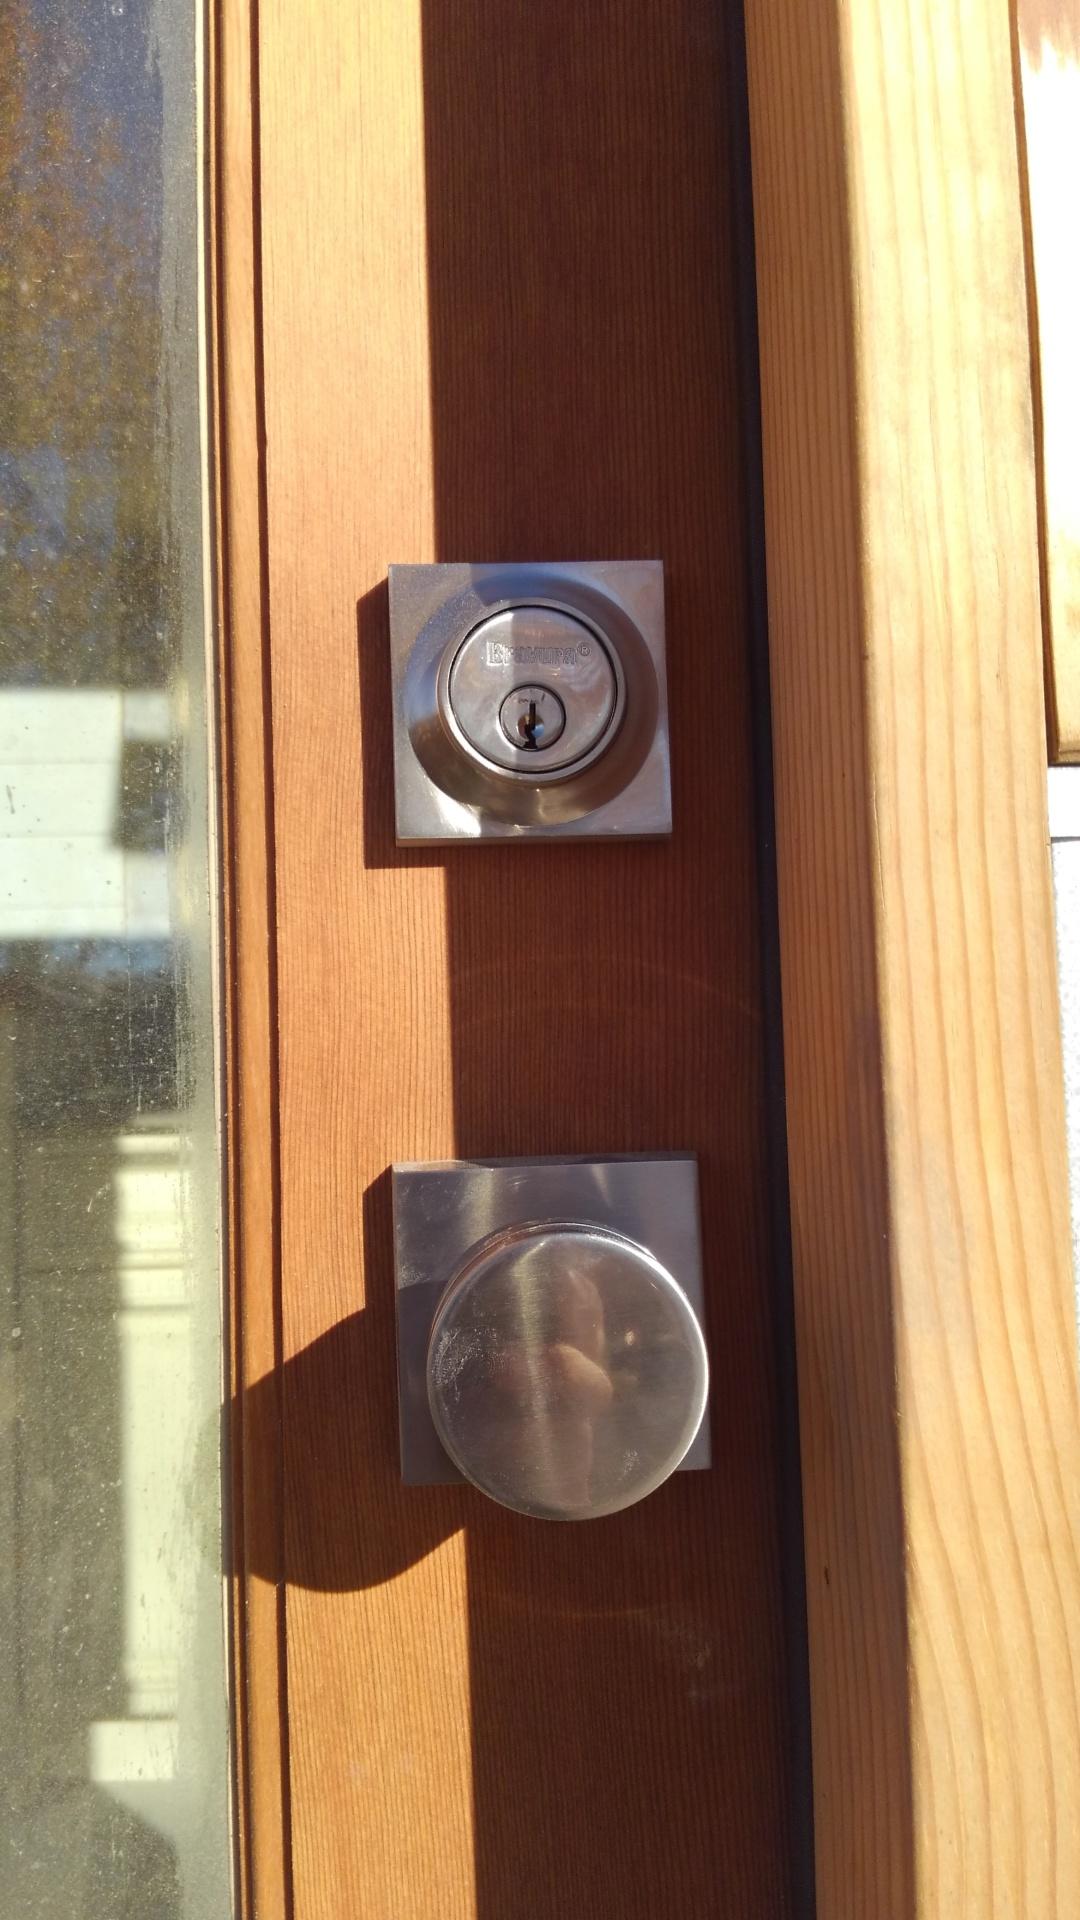 Knob and lock installed on front door